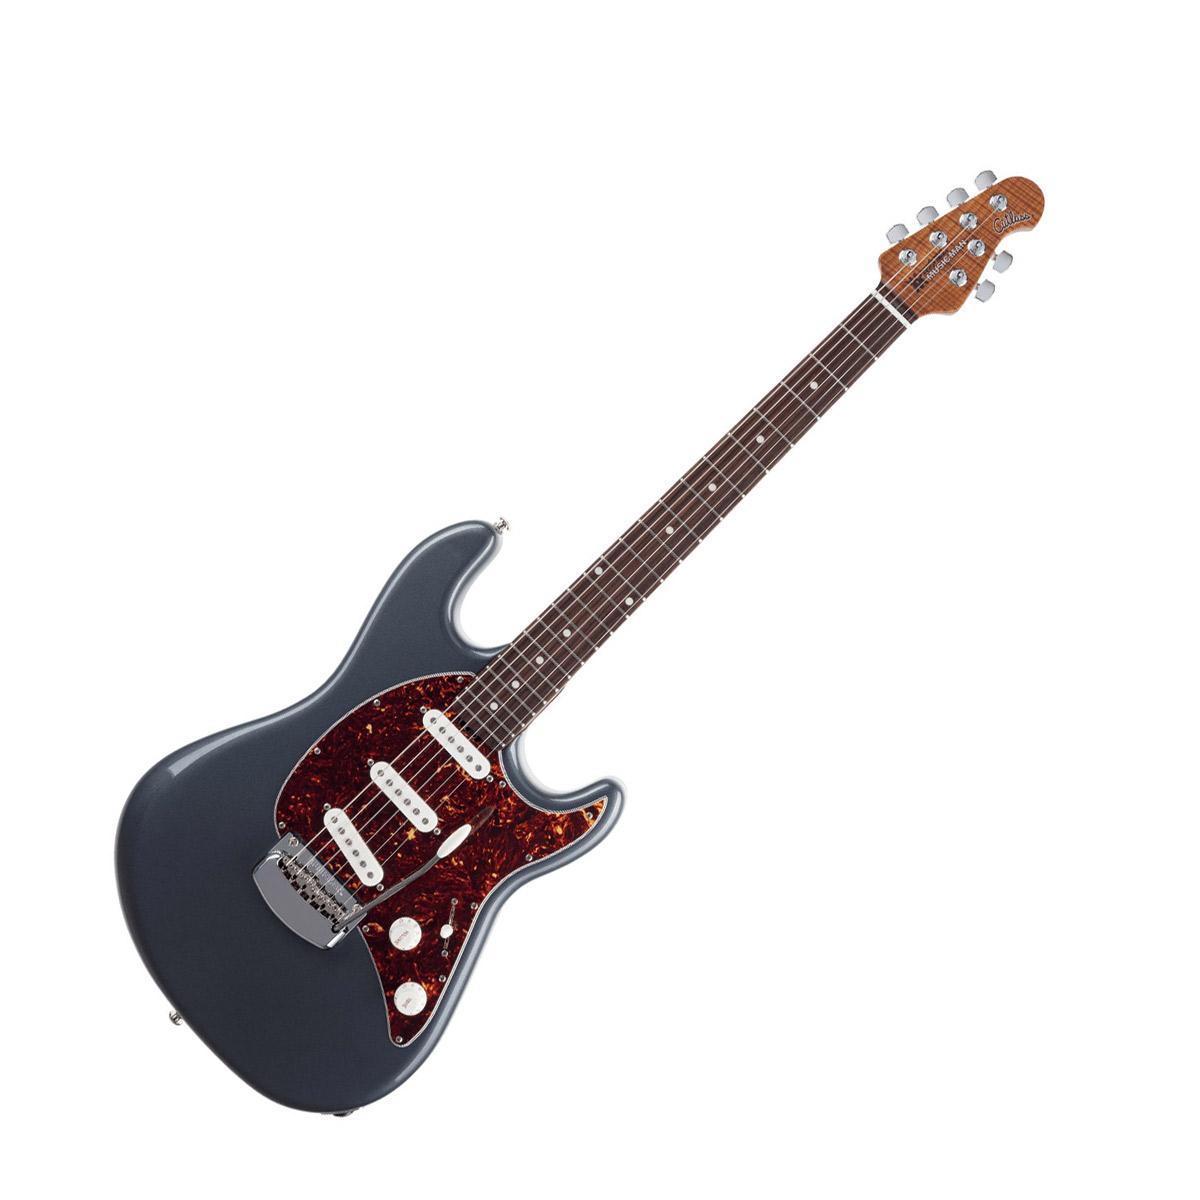 MUSICMAN Cutlass RS Charcoal Cutlass RS Frost エレキギター【ミュージックマン MUSICMAN】, 家具のファンタス:5c5a8d6d --- officewill.xsrv.jp